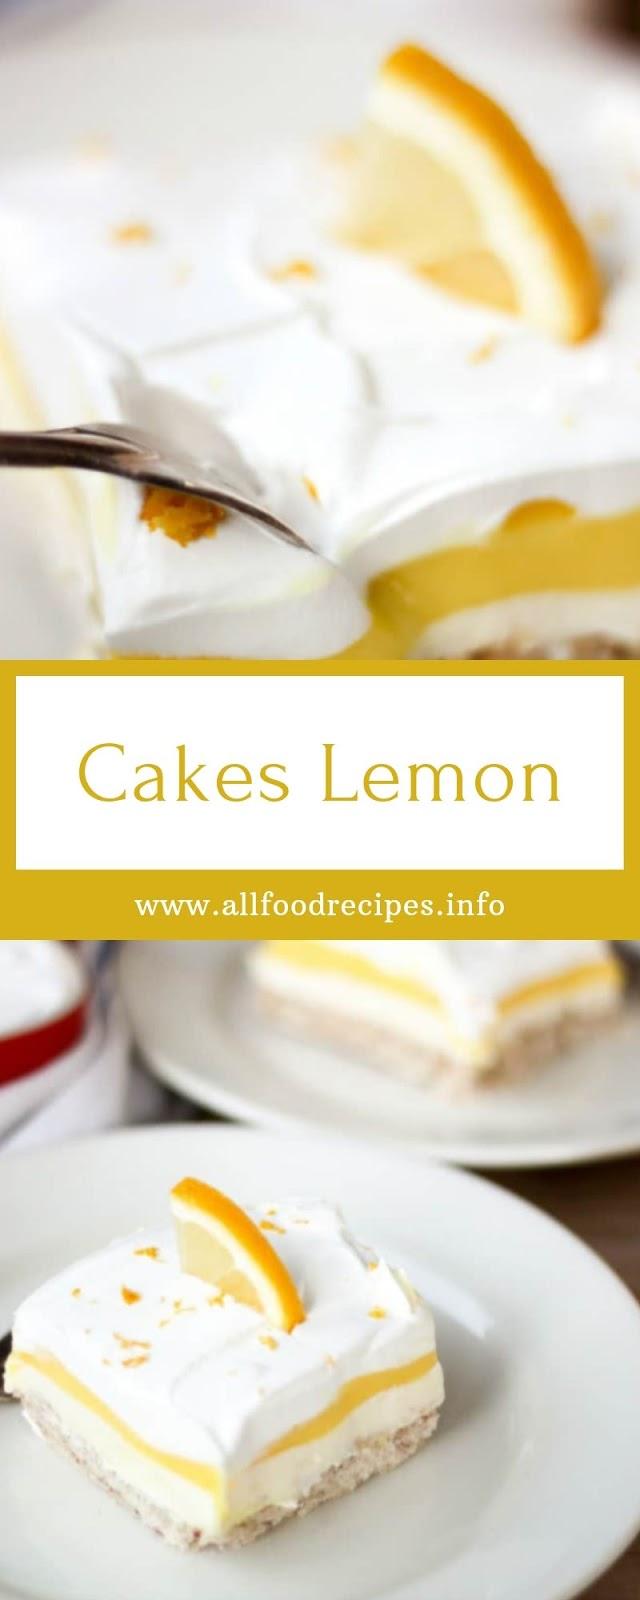 Cakes Lemon